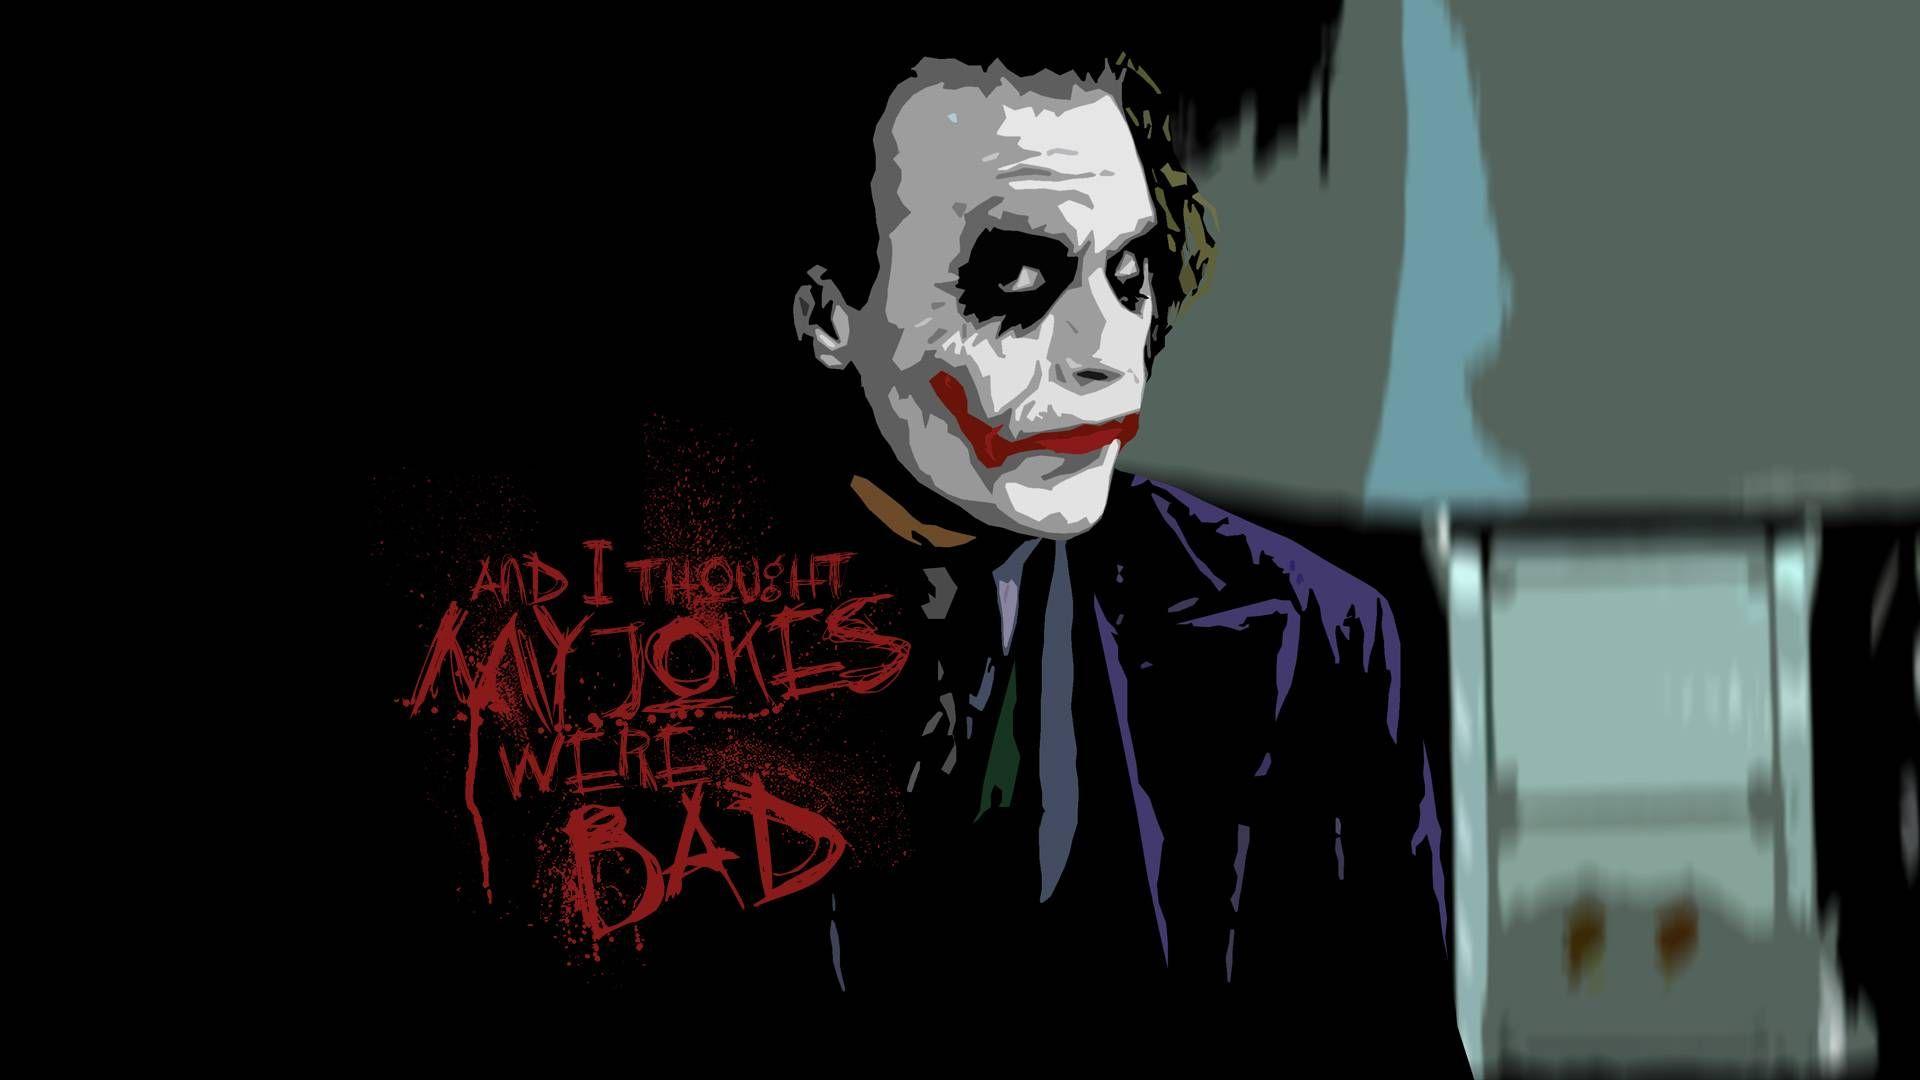 Dark Knight Joker Wallpaper 4k 1920x1080 Wallpaper Teahub Io